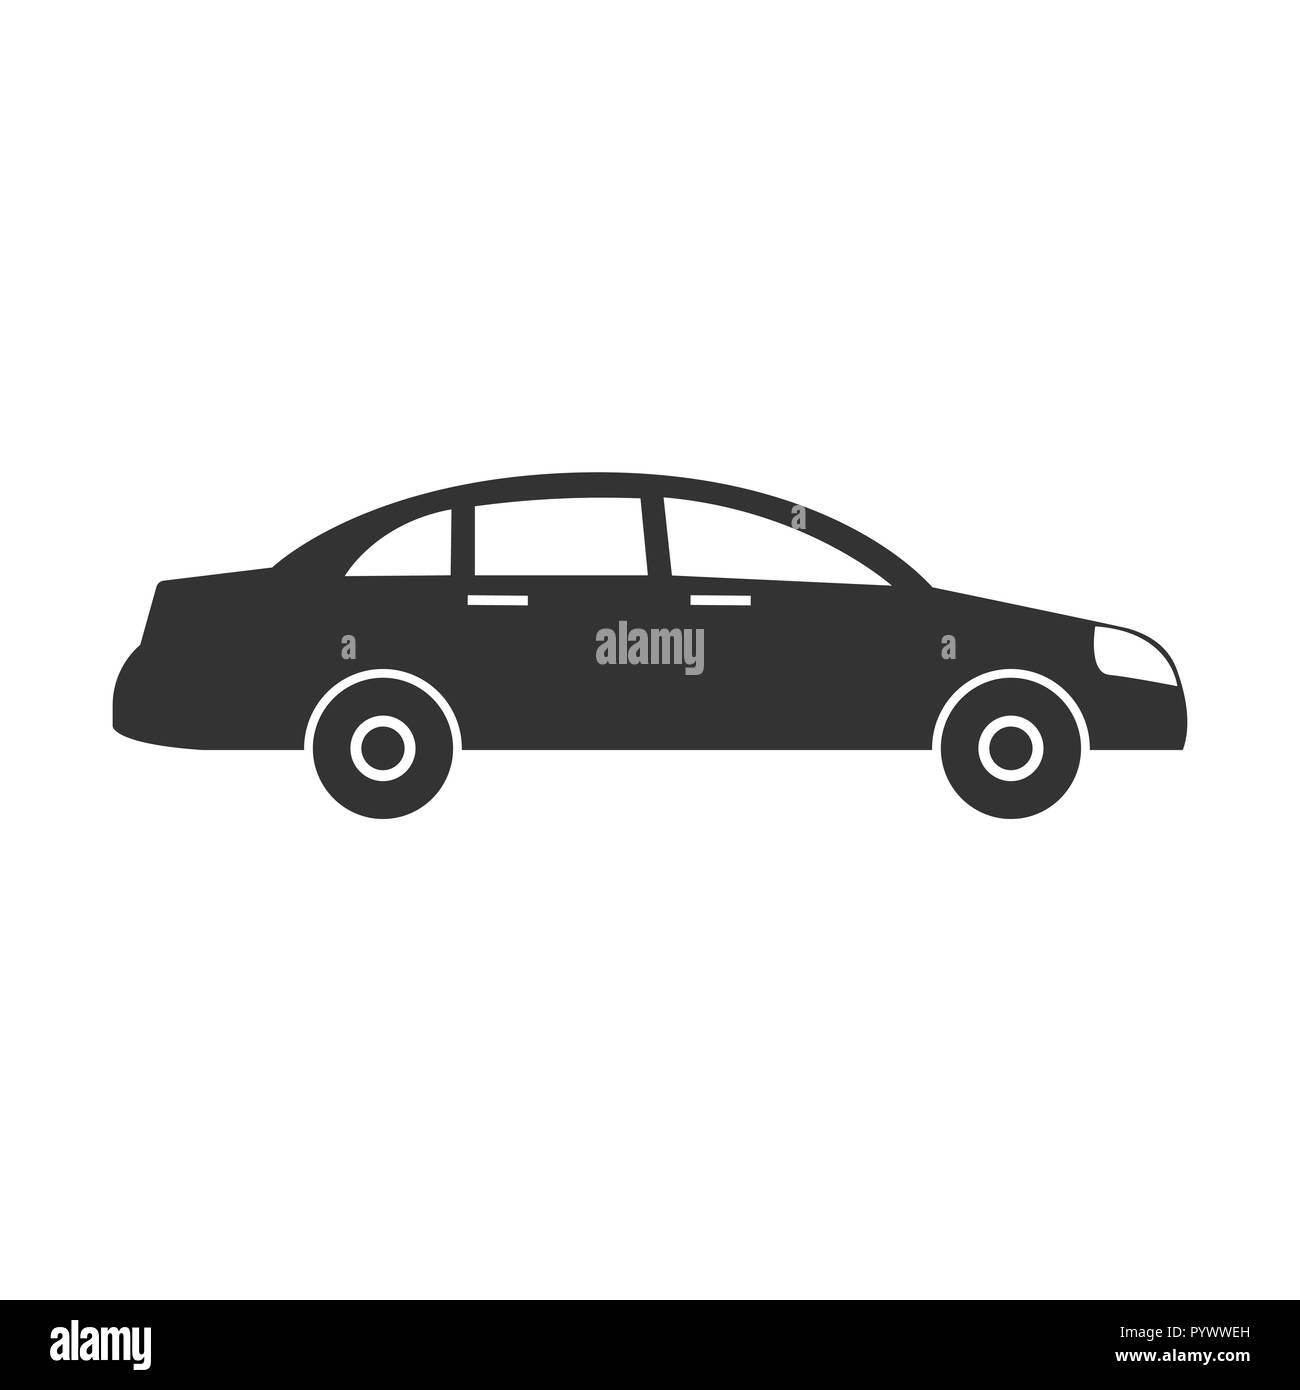 Car icon. Vector illustrations. Flat design graphic. - Stock Image